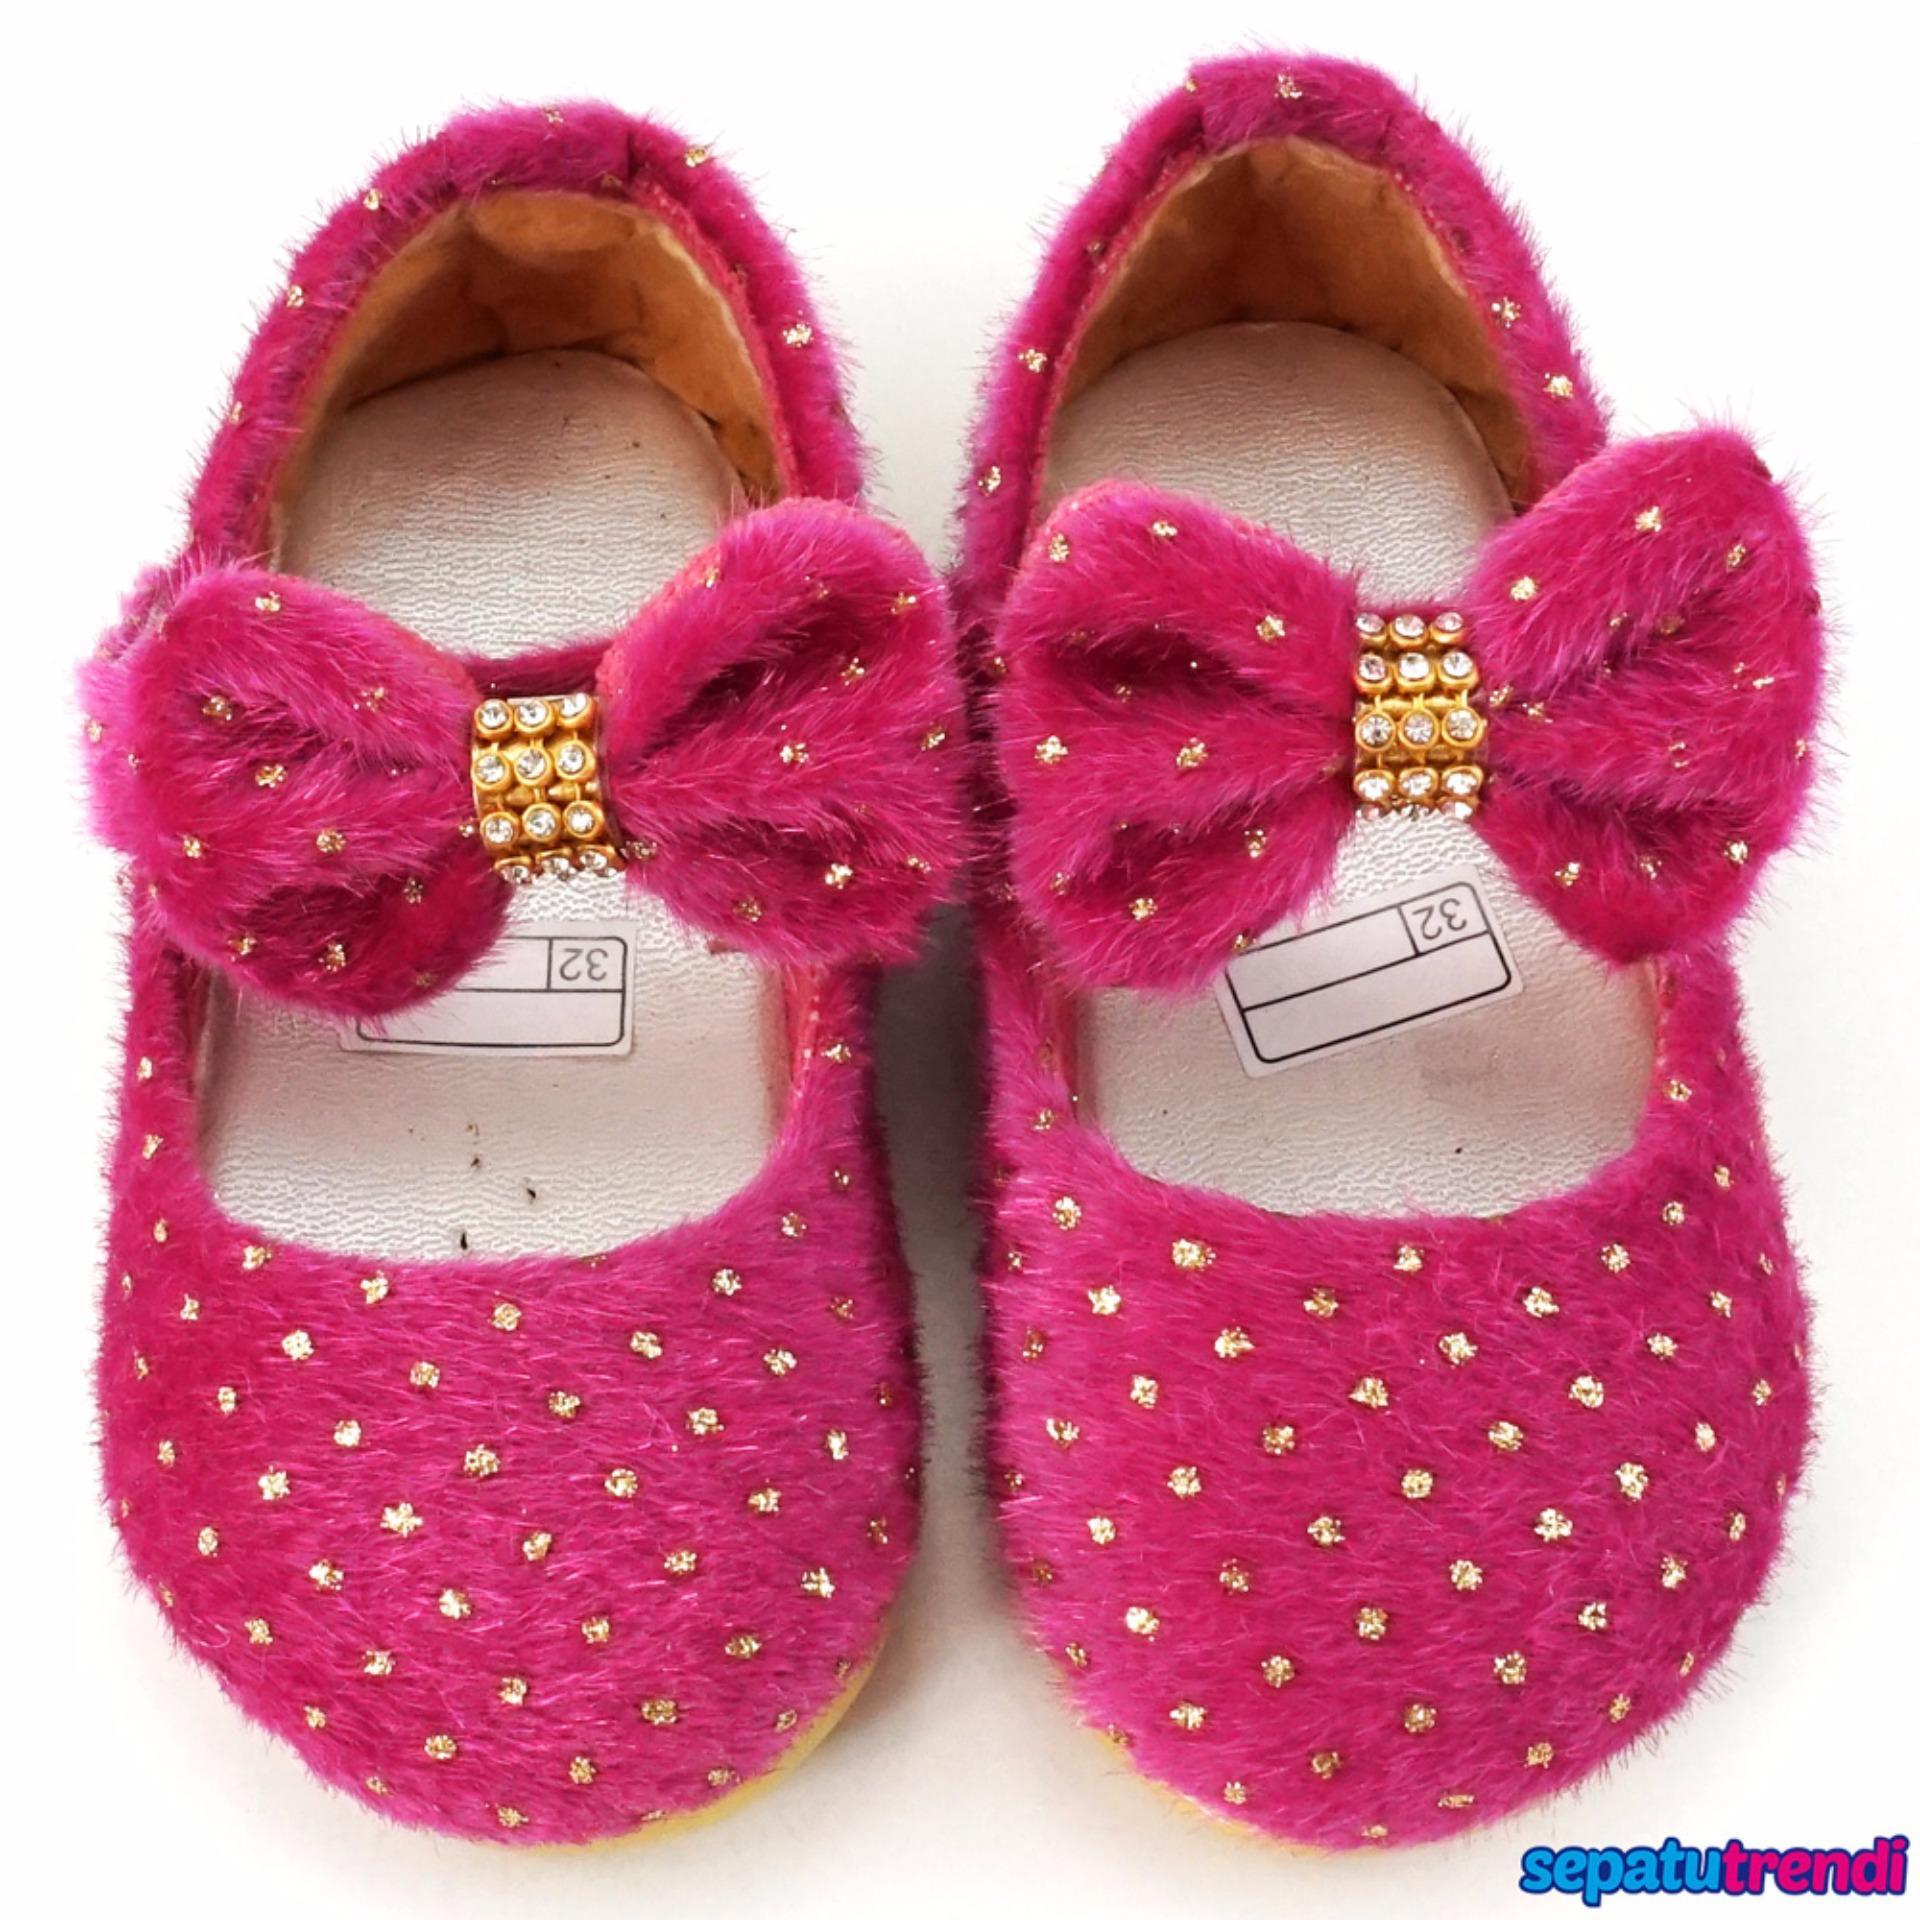 TrendiShoes Sepatu Anak Bayi Perempuan Bahan Bulu AT02 - Fuchsia . 3827fcdd9c